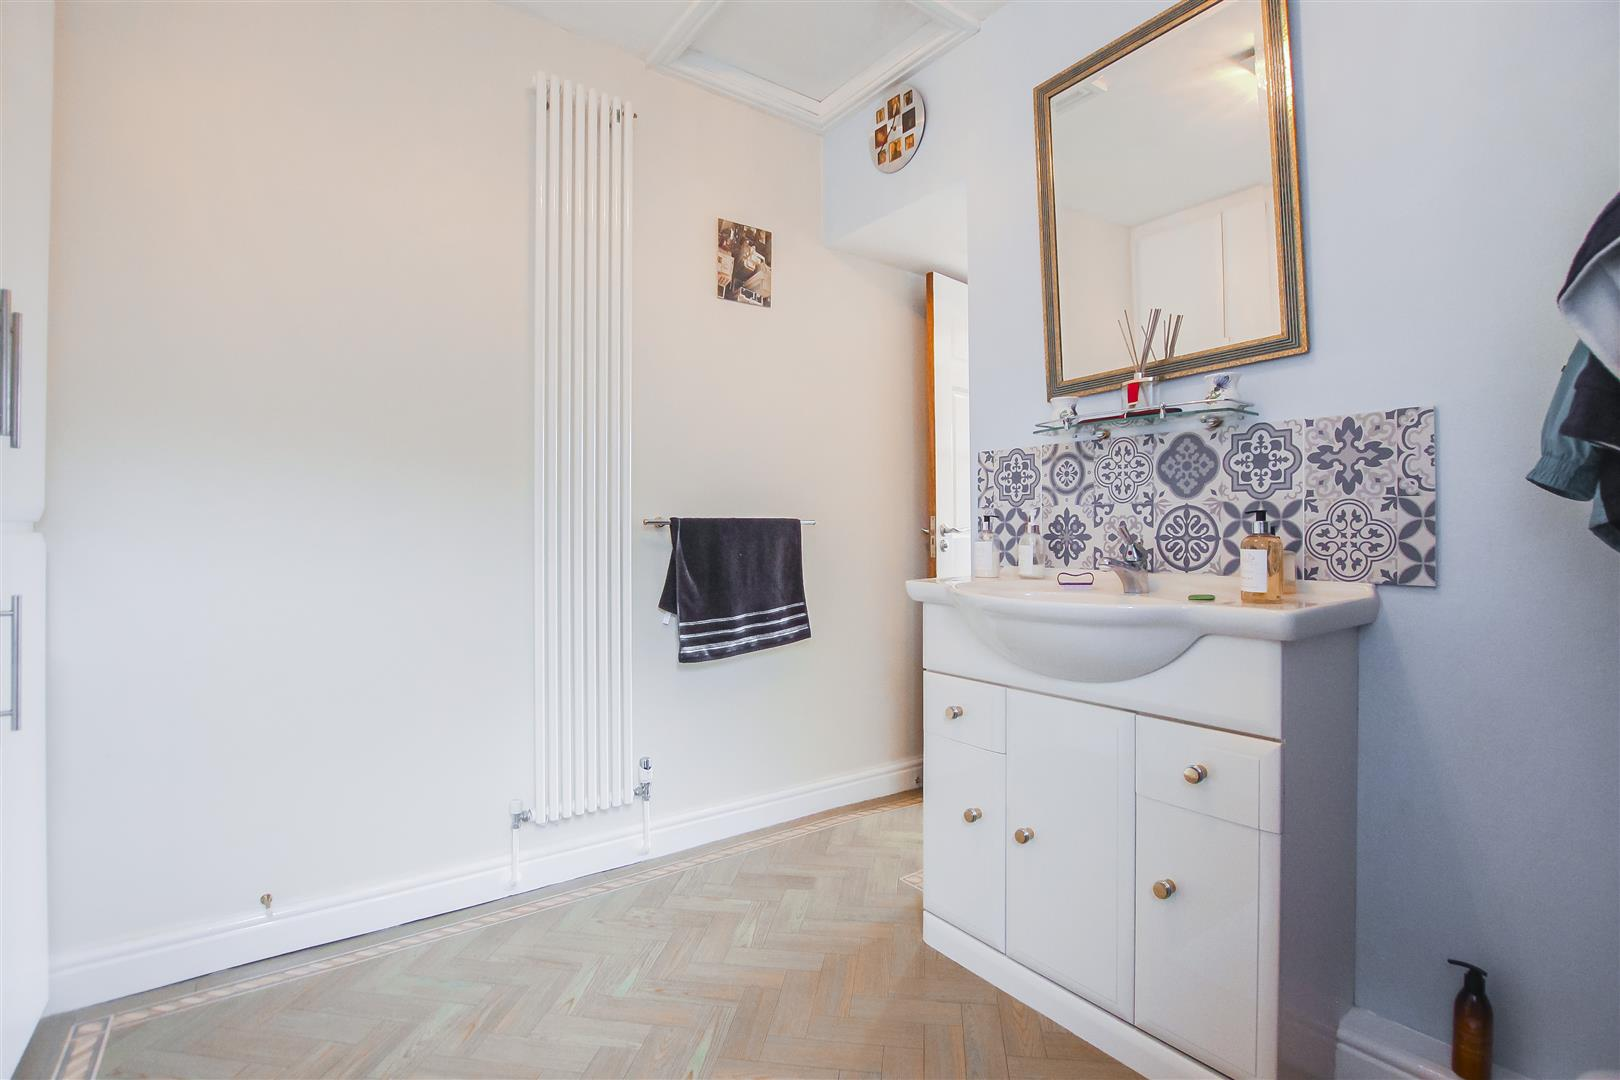 6 Bedroom Detached House For Sale - Annex W/C